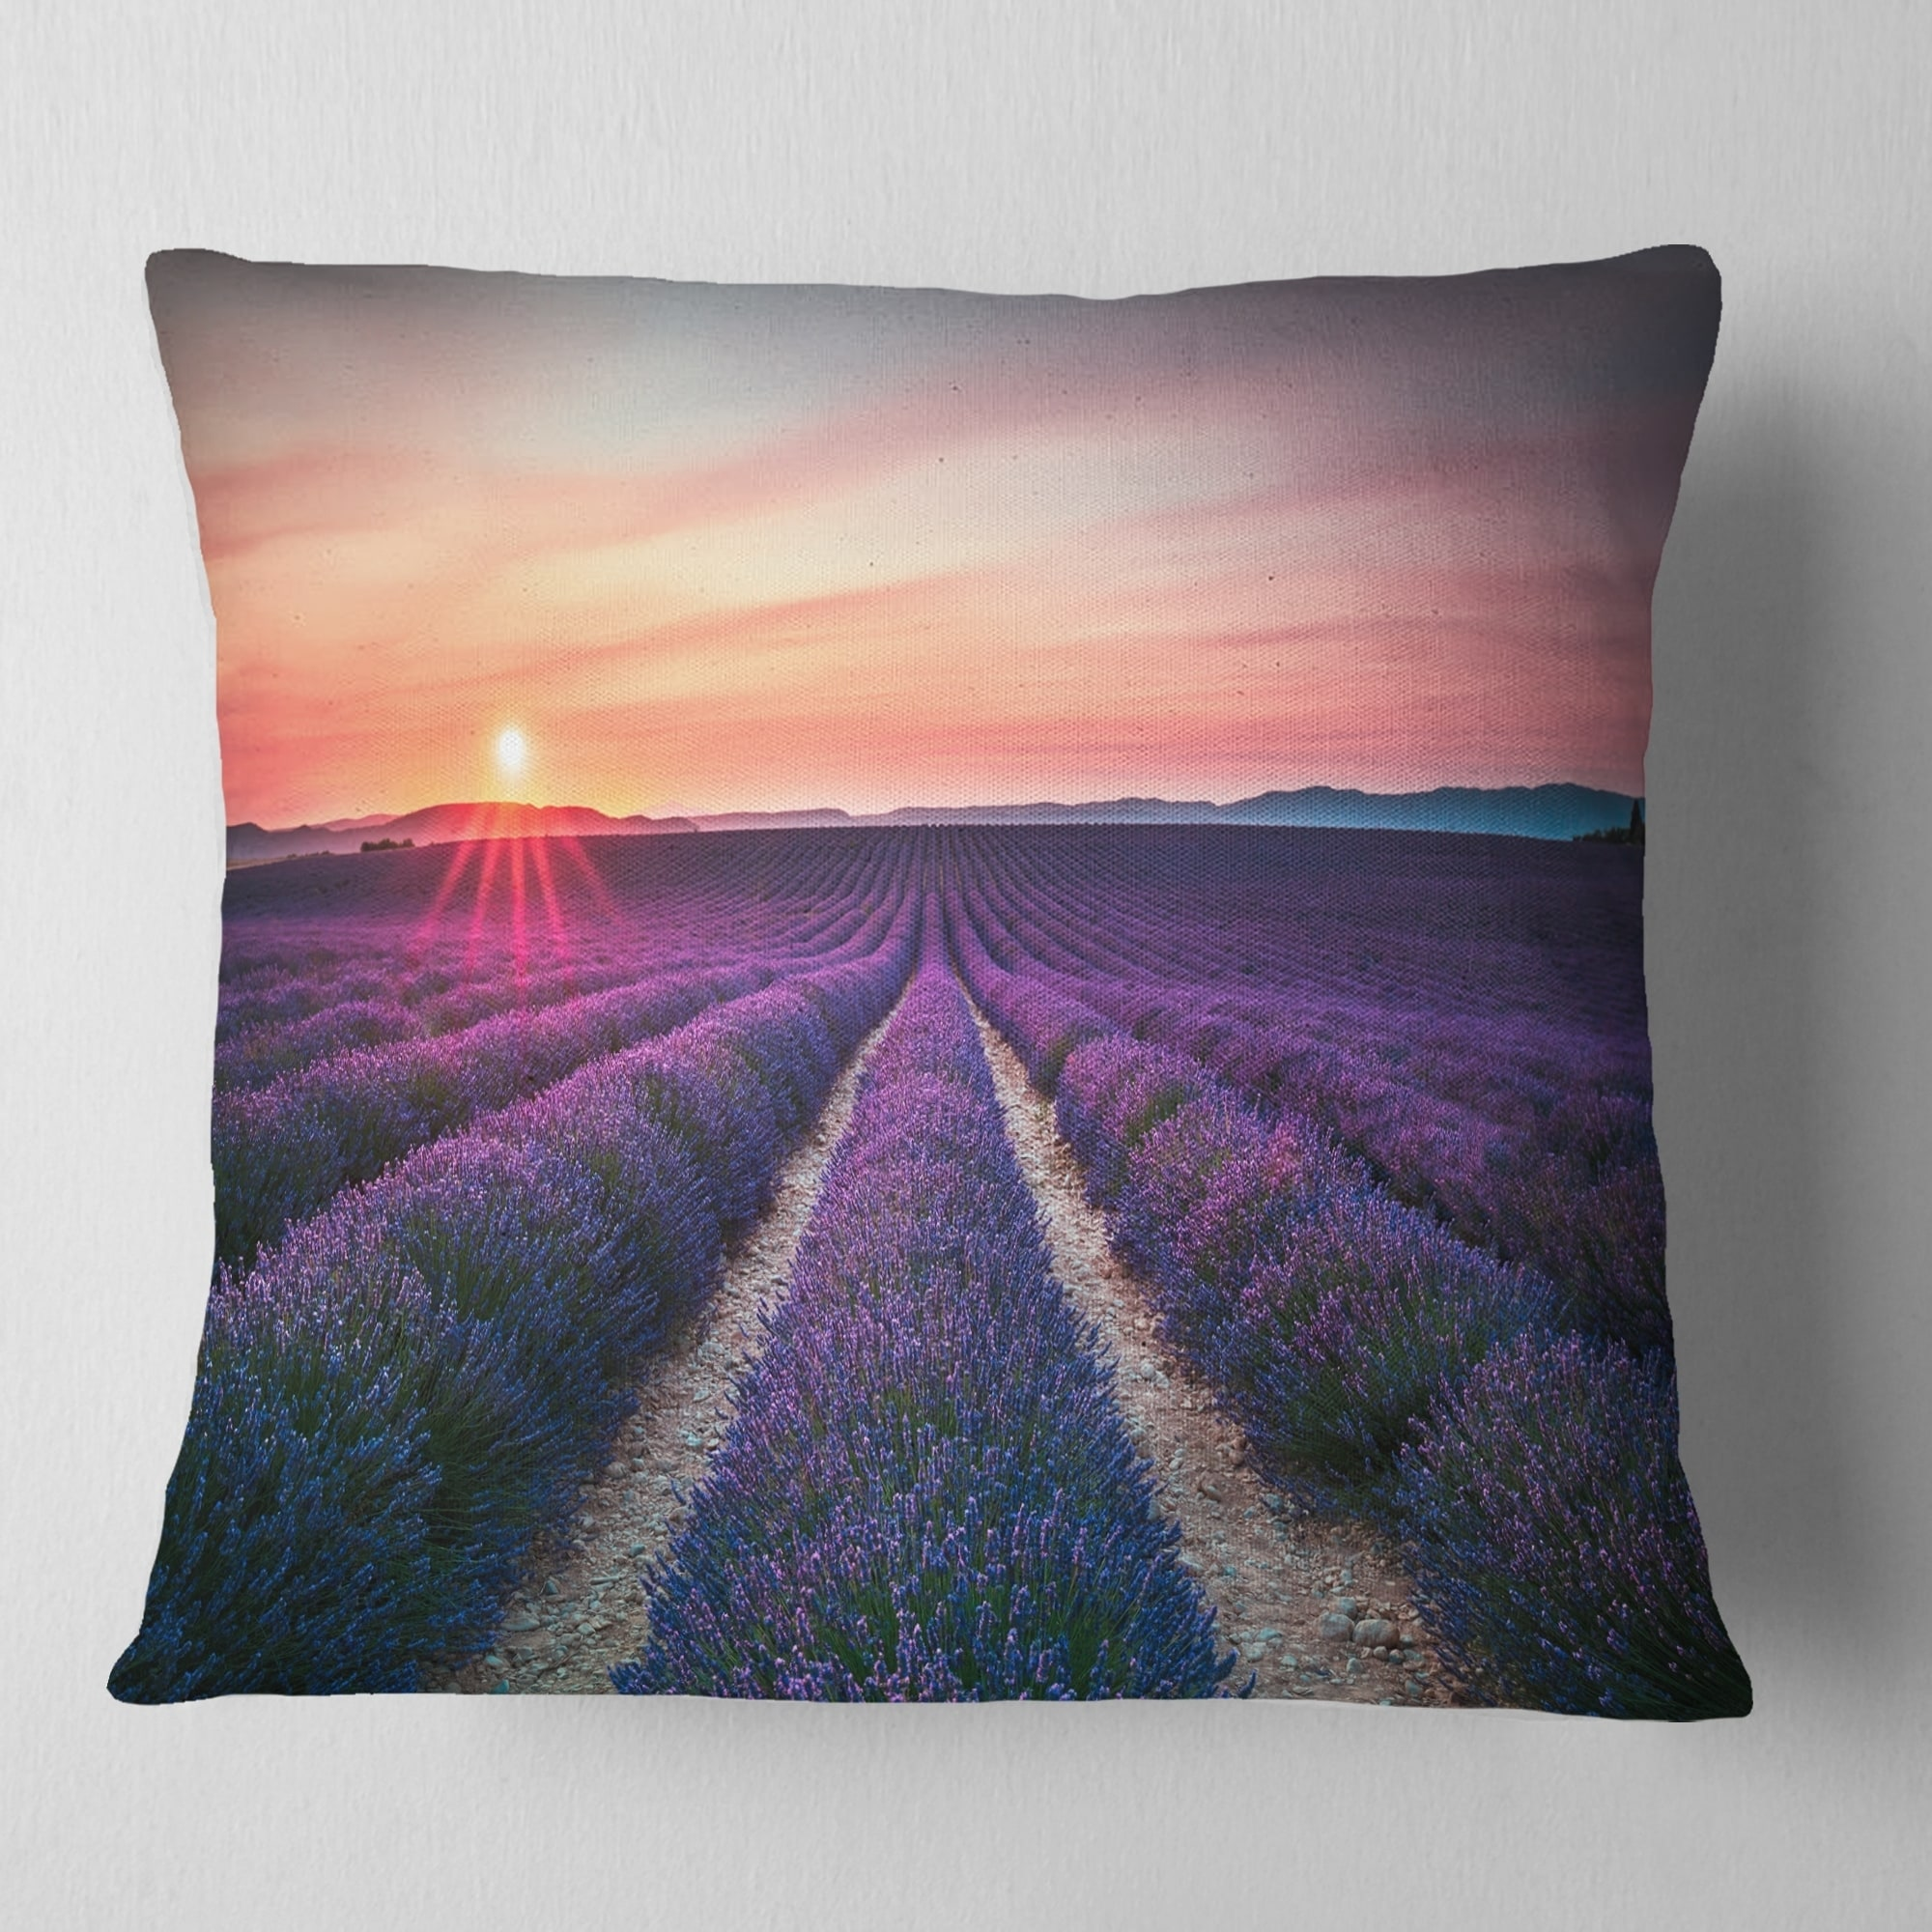 Design Art Designart Endless Rows Of Lavender Flowers Modern Landscape Printed Throw Pillow Walmart Com Walmart Com